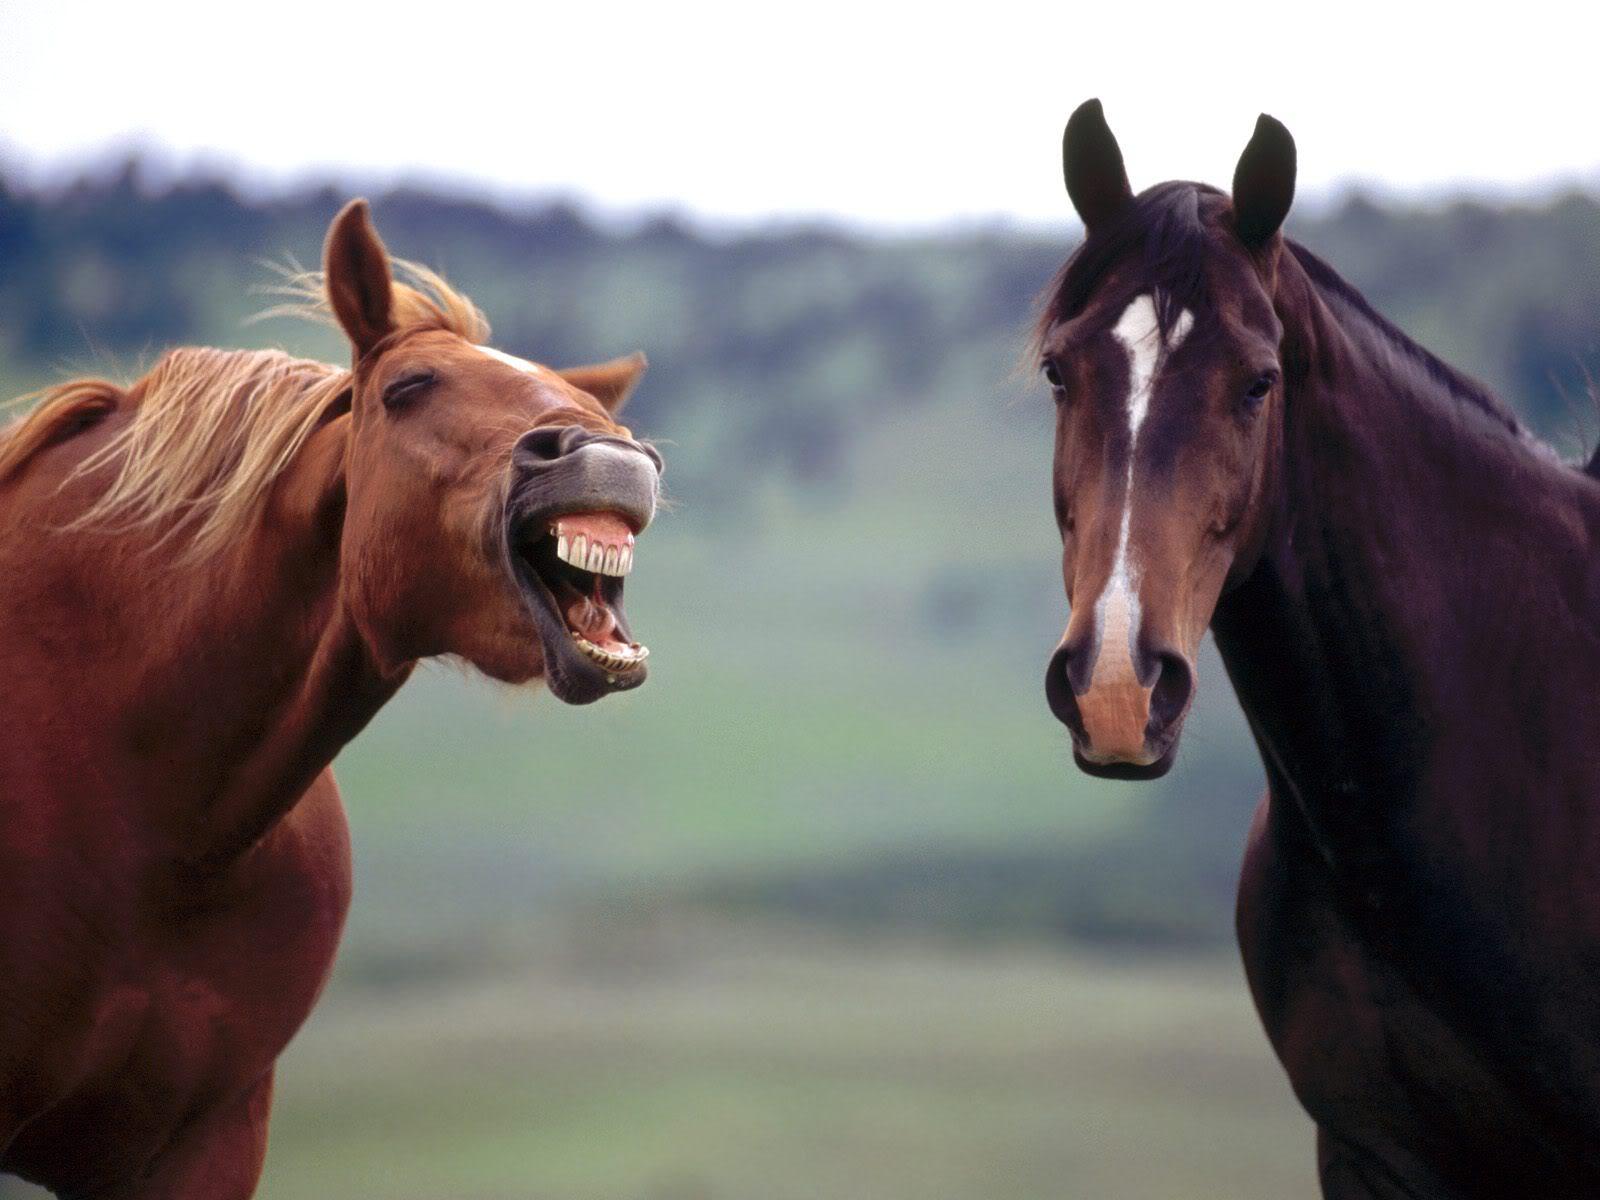 Horse | 馬 | Ngựa Horse-Play